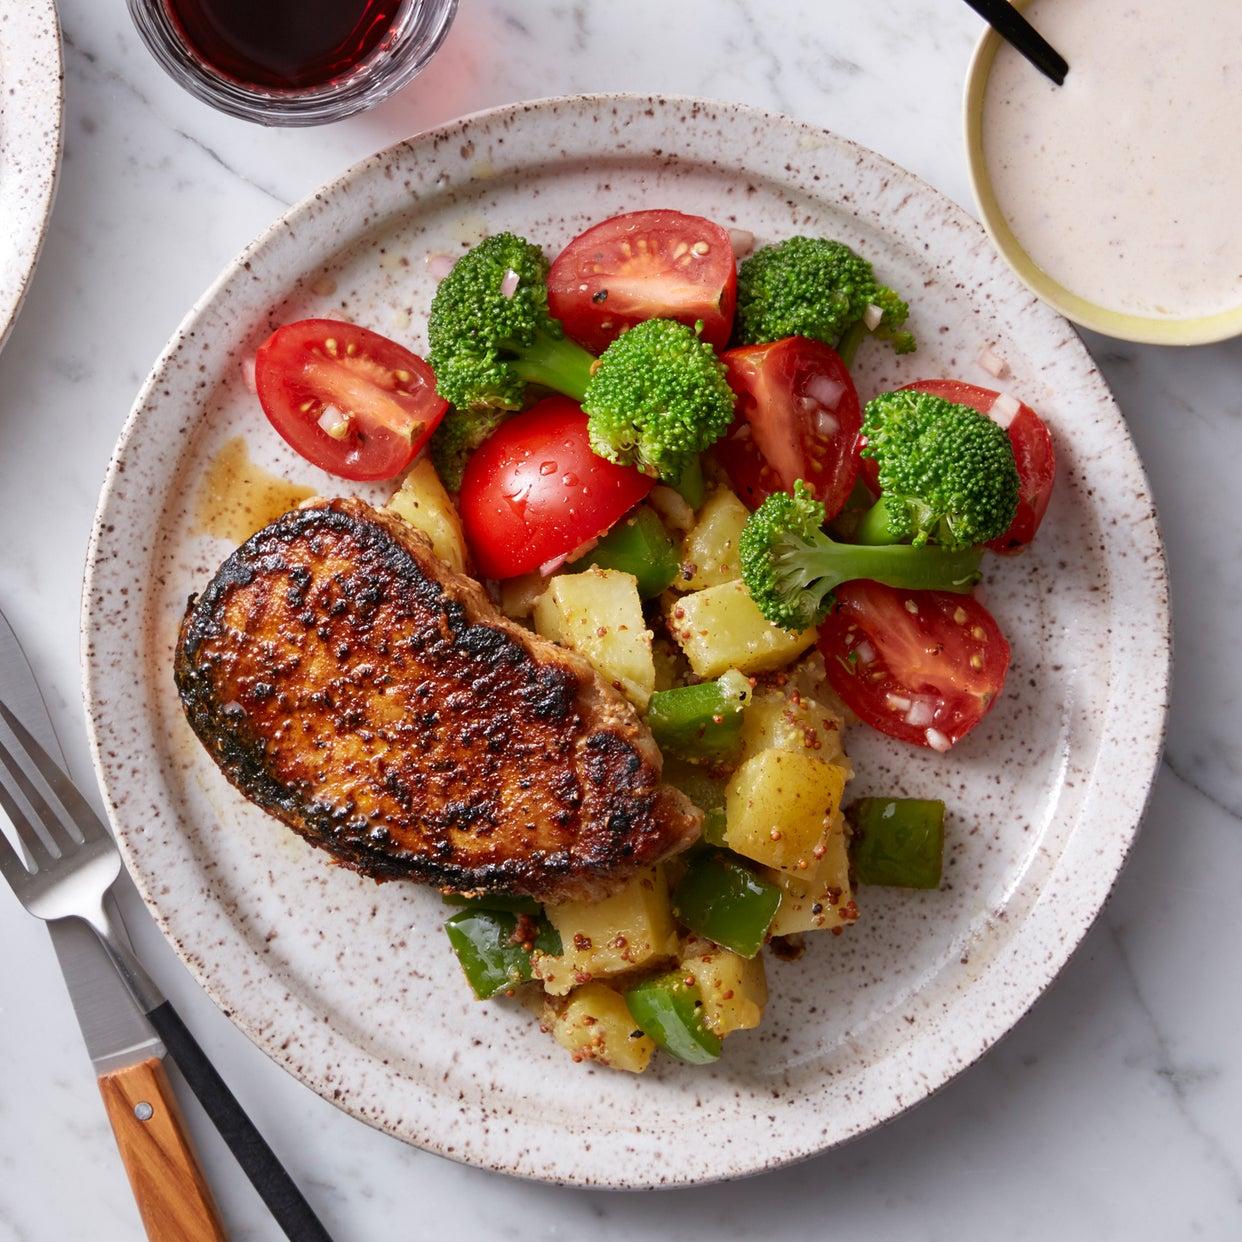 Barbecue Spice-Rubbed Pork Chops with Potato Salad & Marinated Broccoli